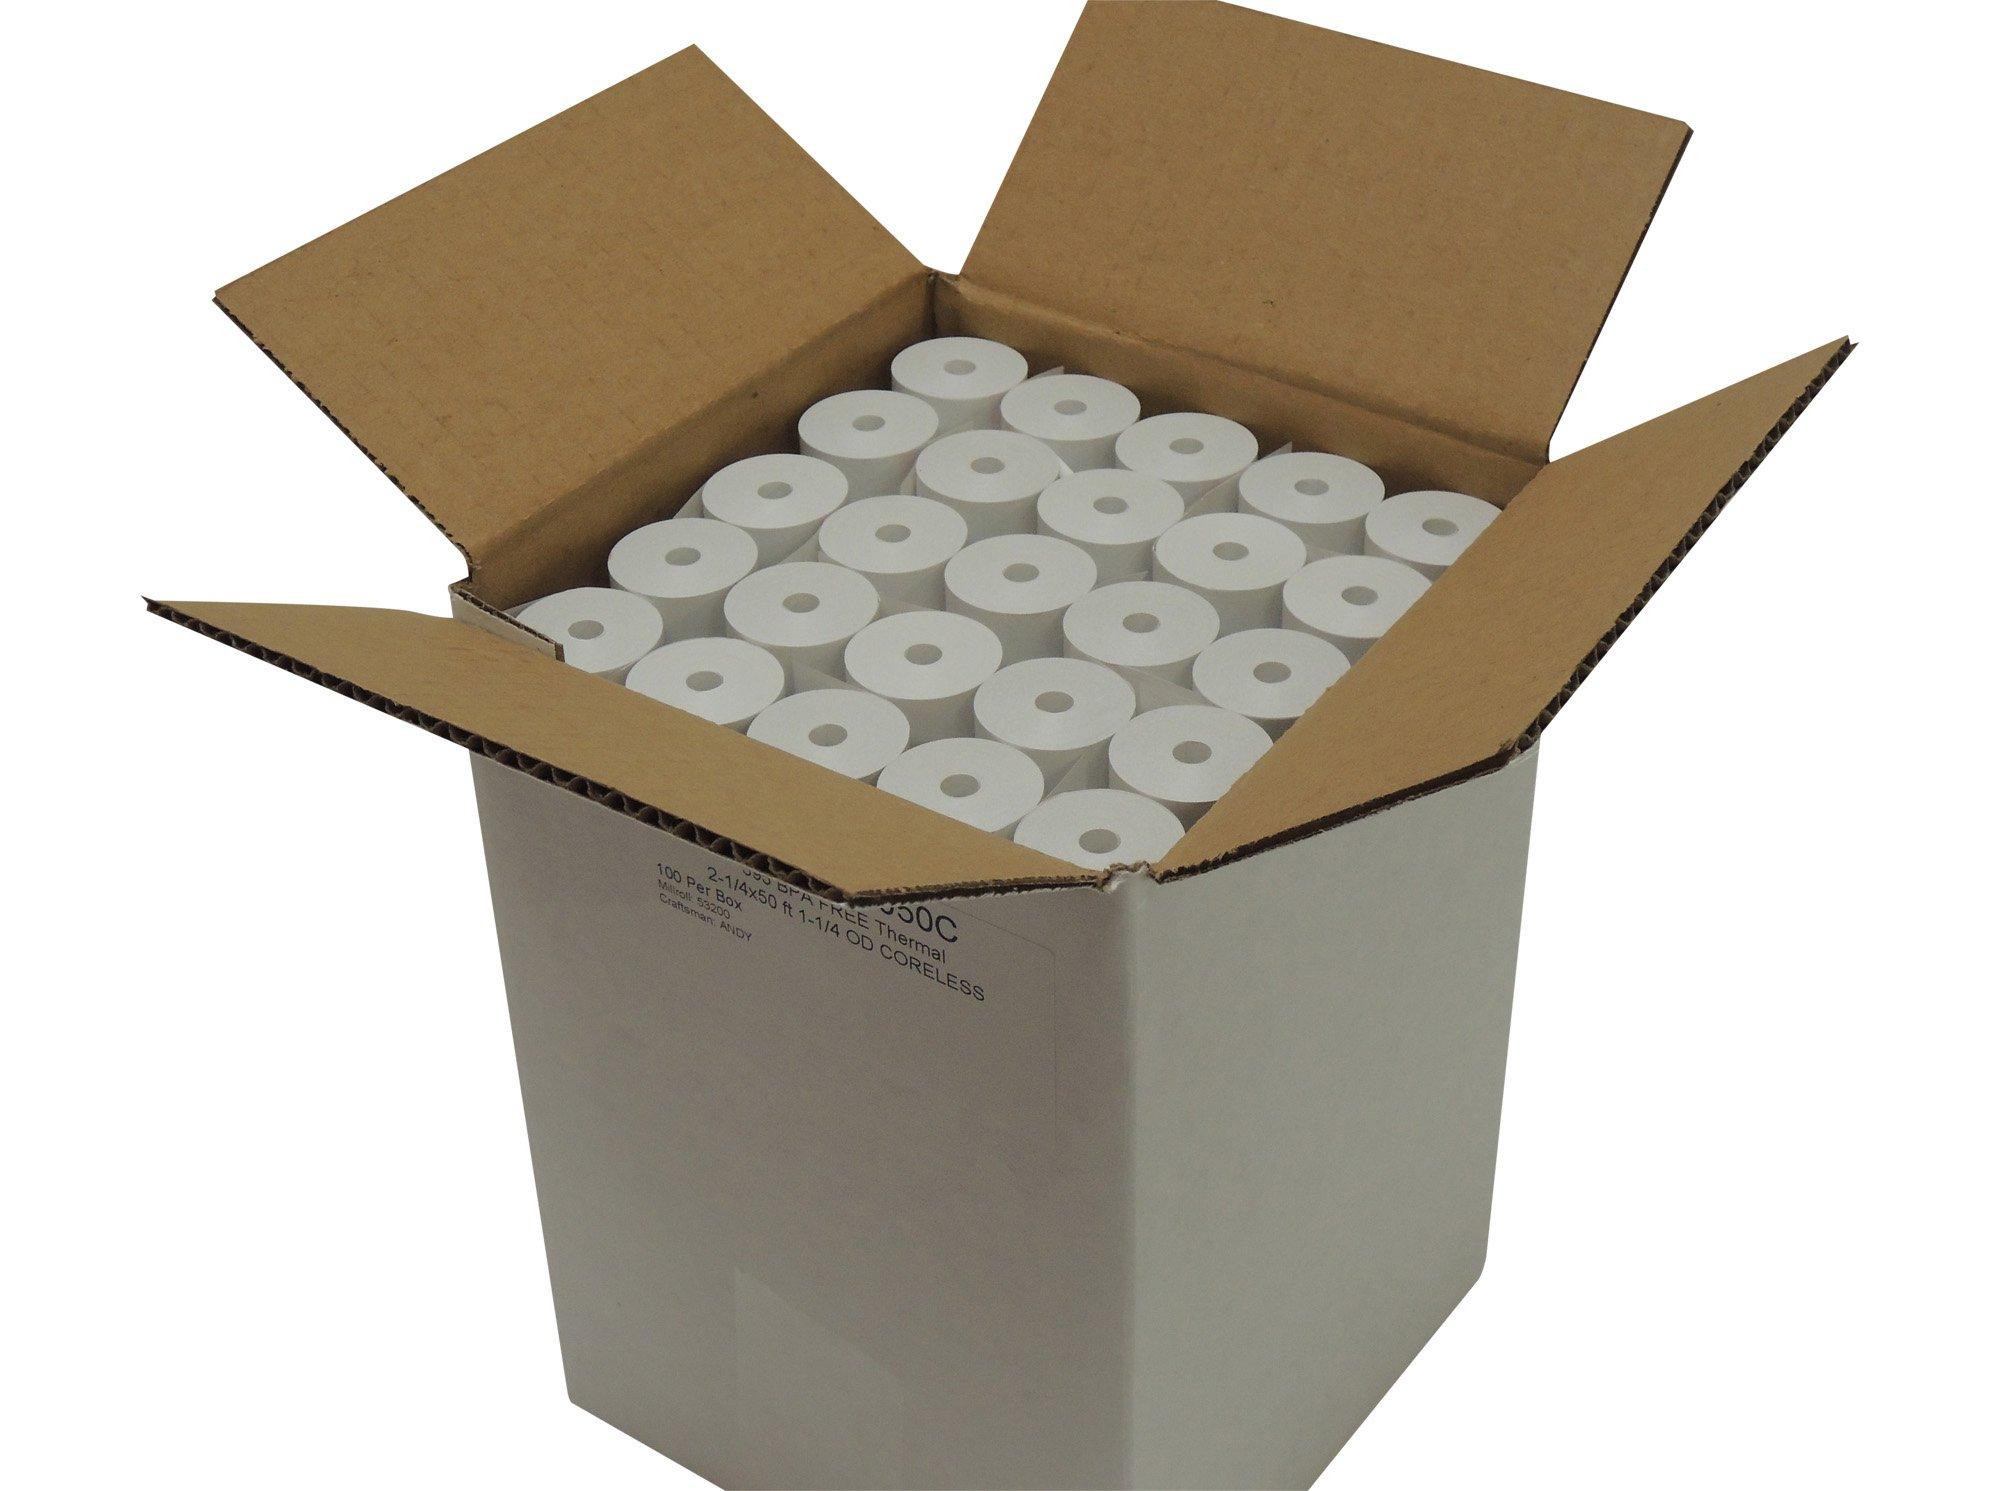 POS1 2 1/4 x 50 ft x 30mm diameter BPA Free Thermal Paper 100 CORELESS Rolls by POS1